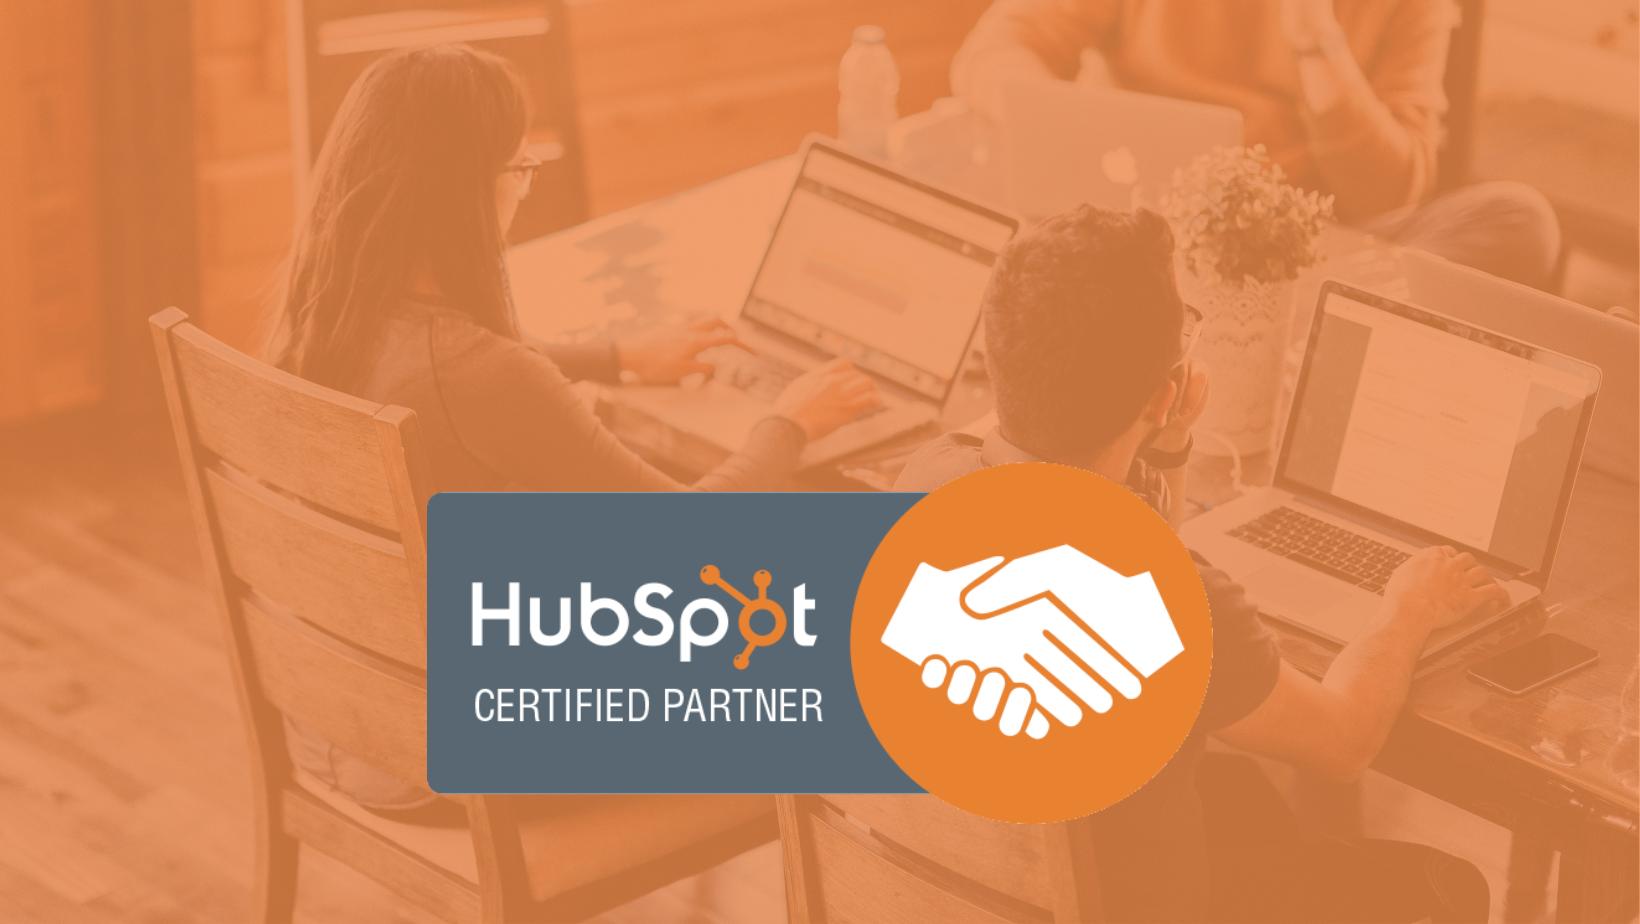 HubSpot Certified Partner Connection Model, Bellevue, Seattle